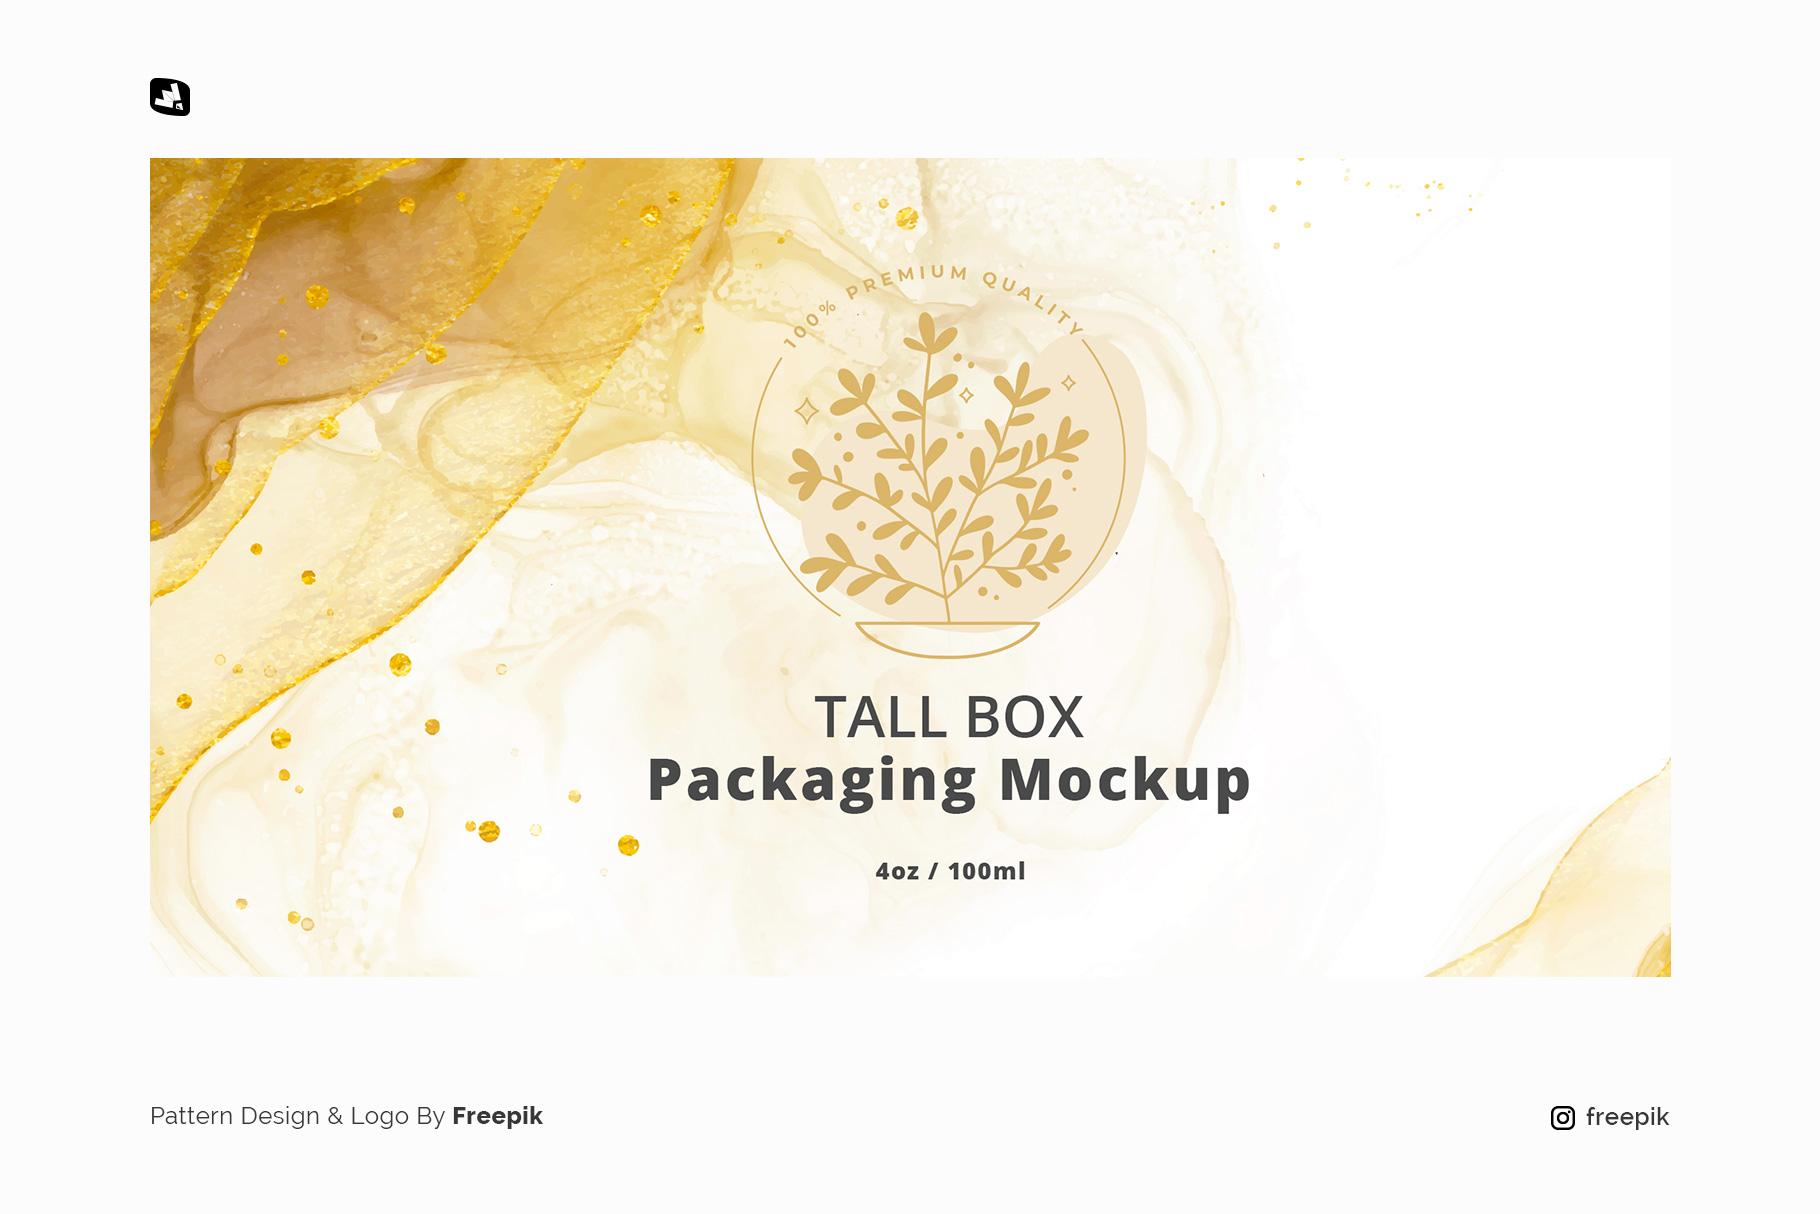 designer's credit of the glass cosmetic jar packaging mockup